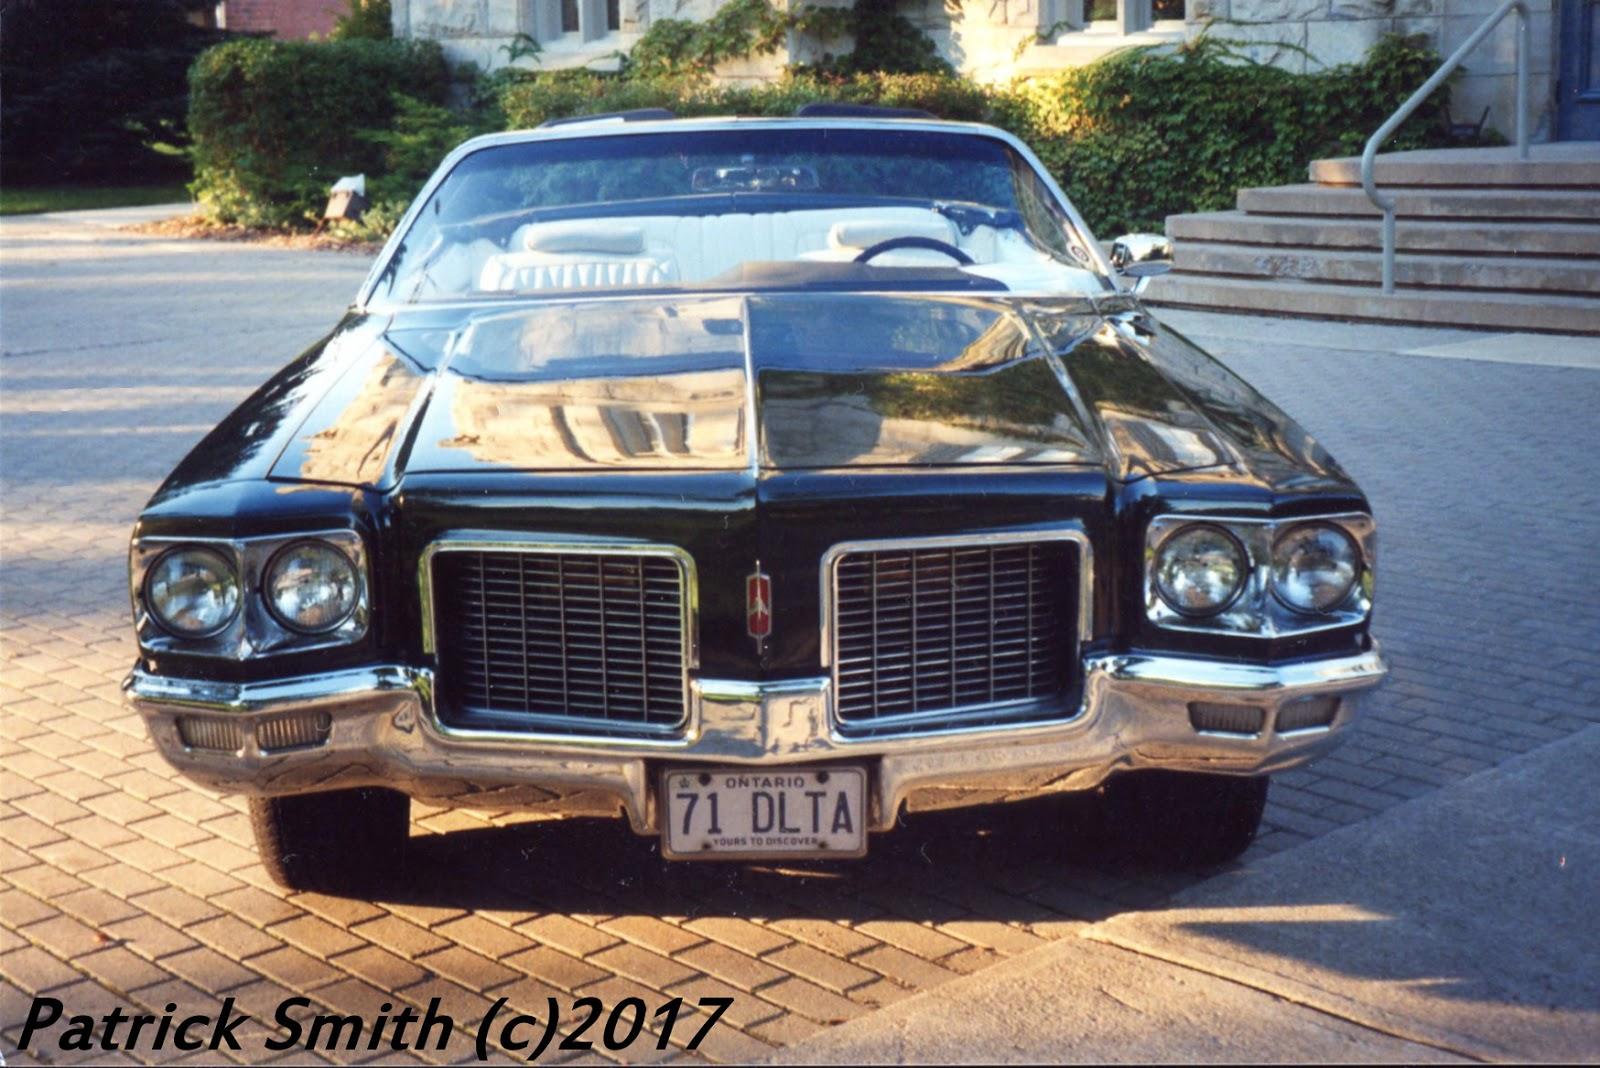 1971 Oldsmobile Delta 88 Convertible Phscollectorcarworld 1960 Pontiac Catalina Wiring Diagrams